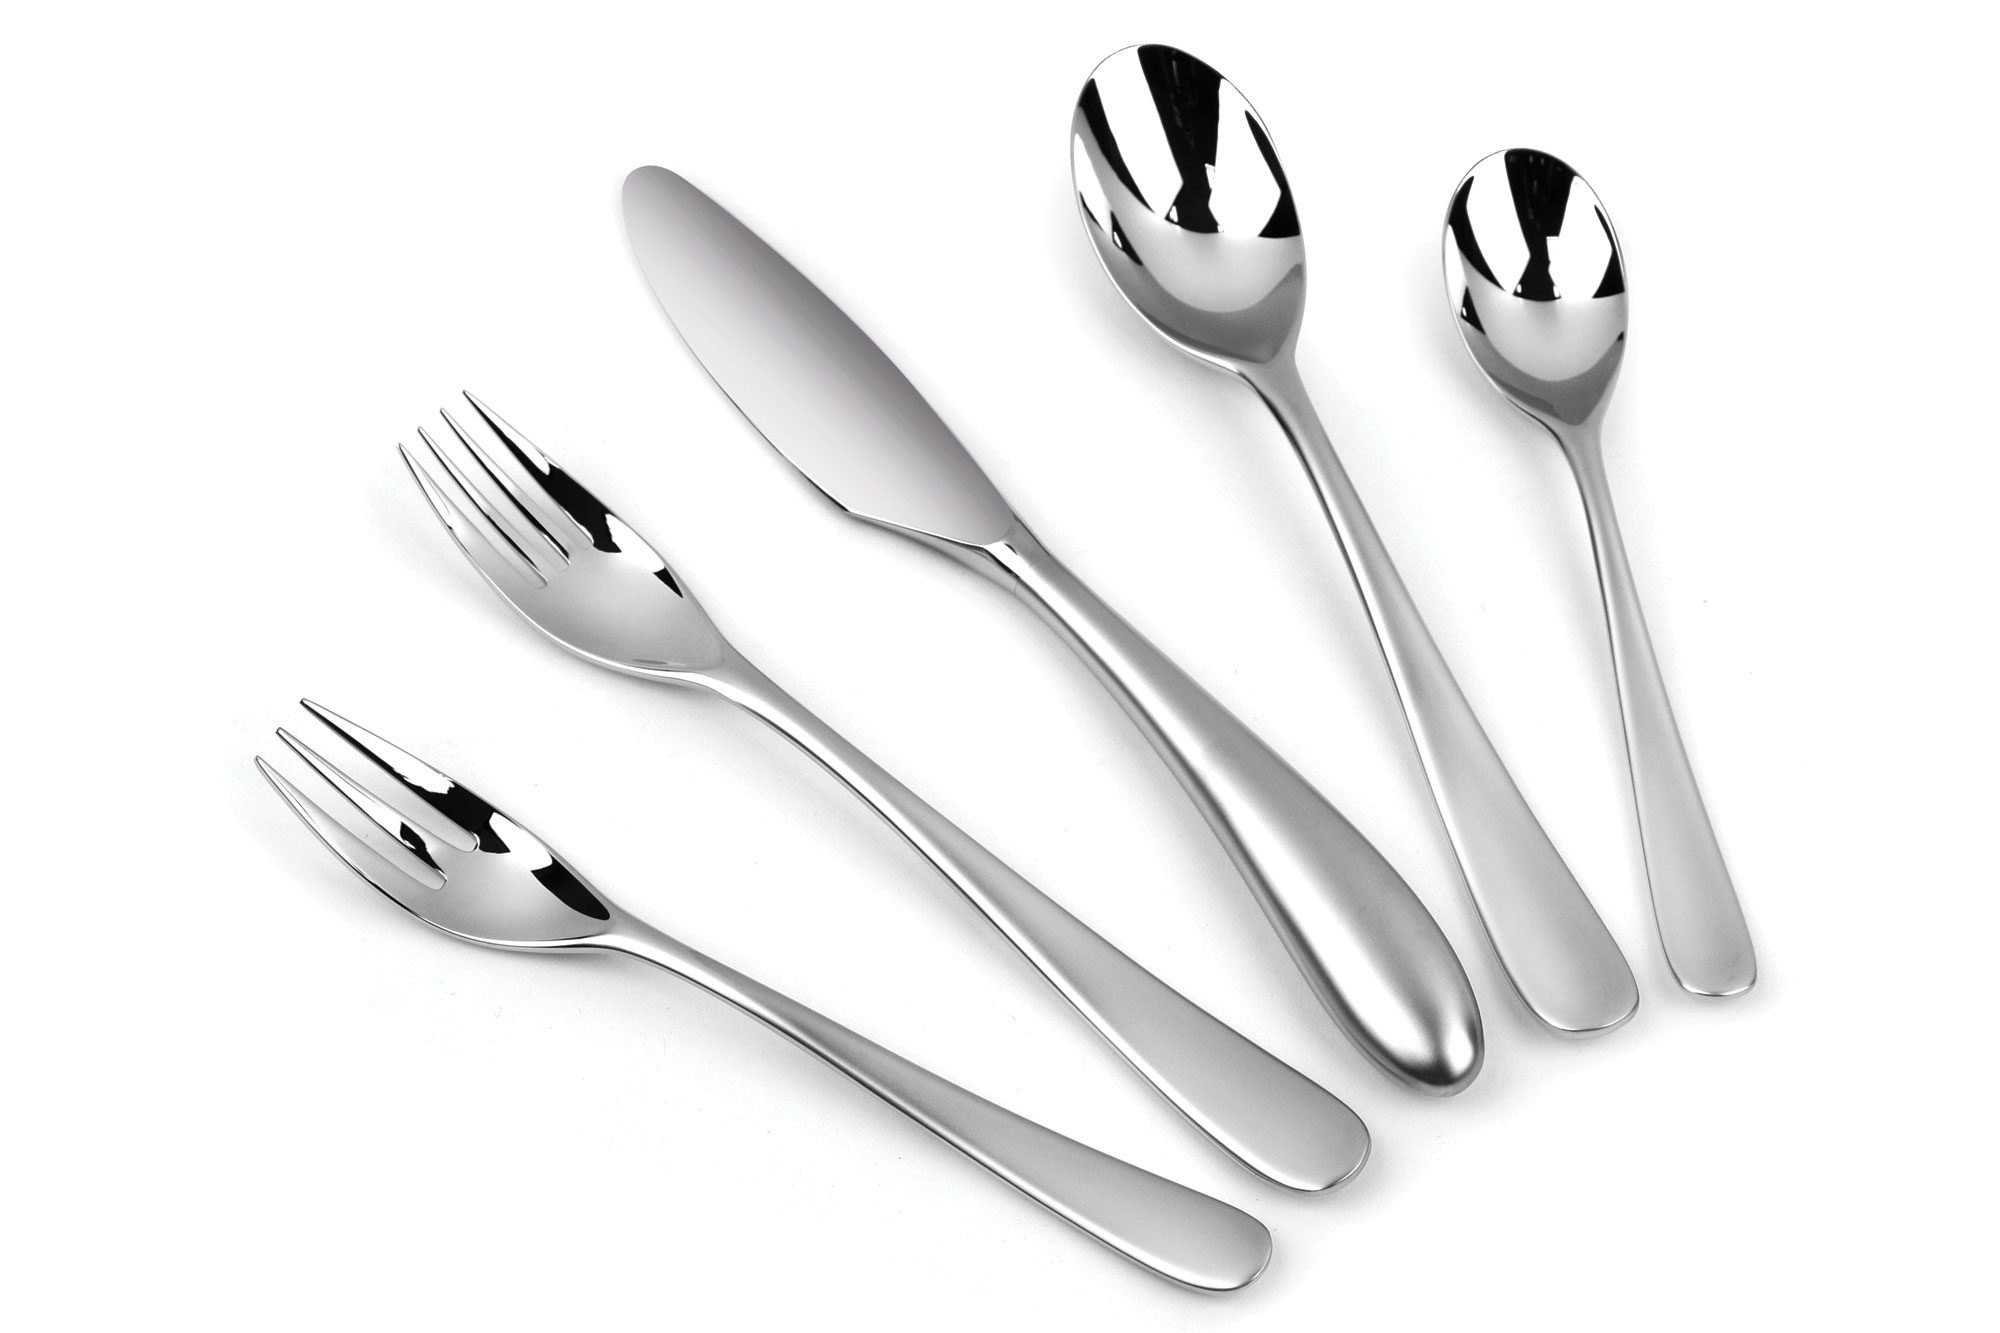 yamazaki aquatique ice stainless steel flatware set 40 piece cutlery and more. Black Bedroom Furniture Sets. Home Design Ideas